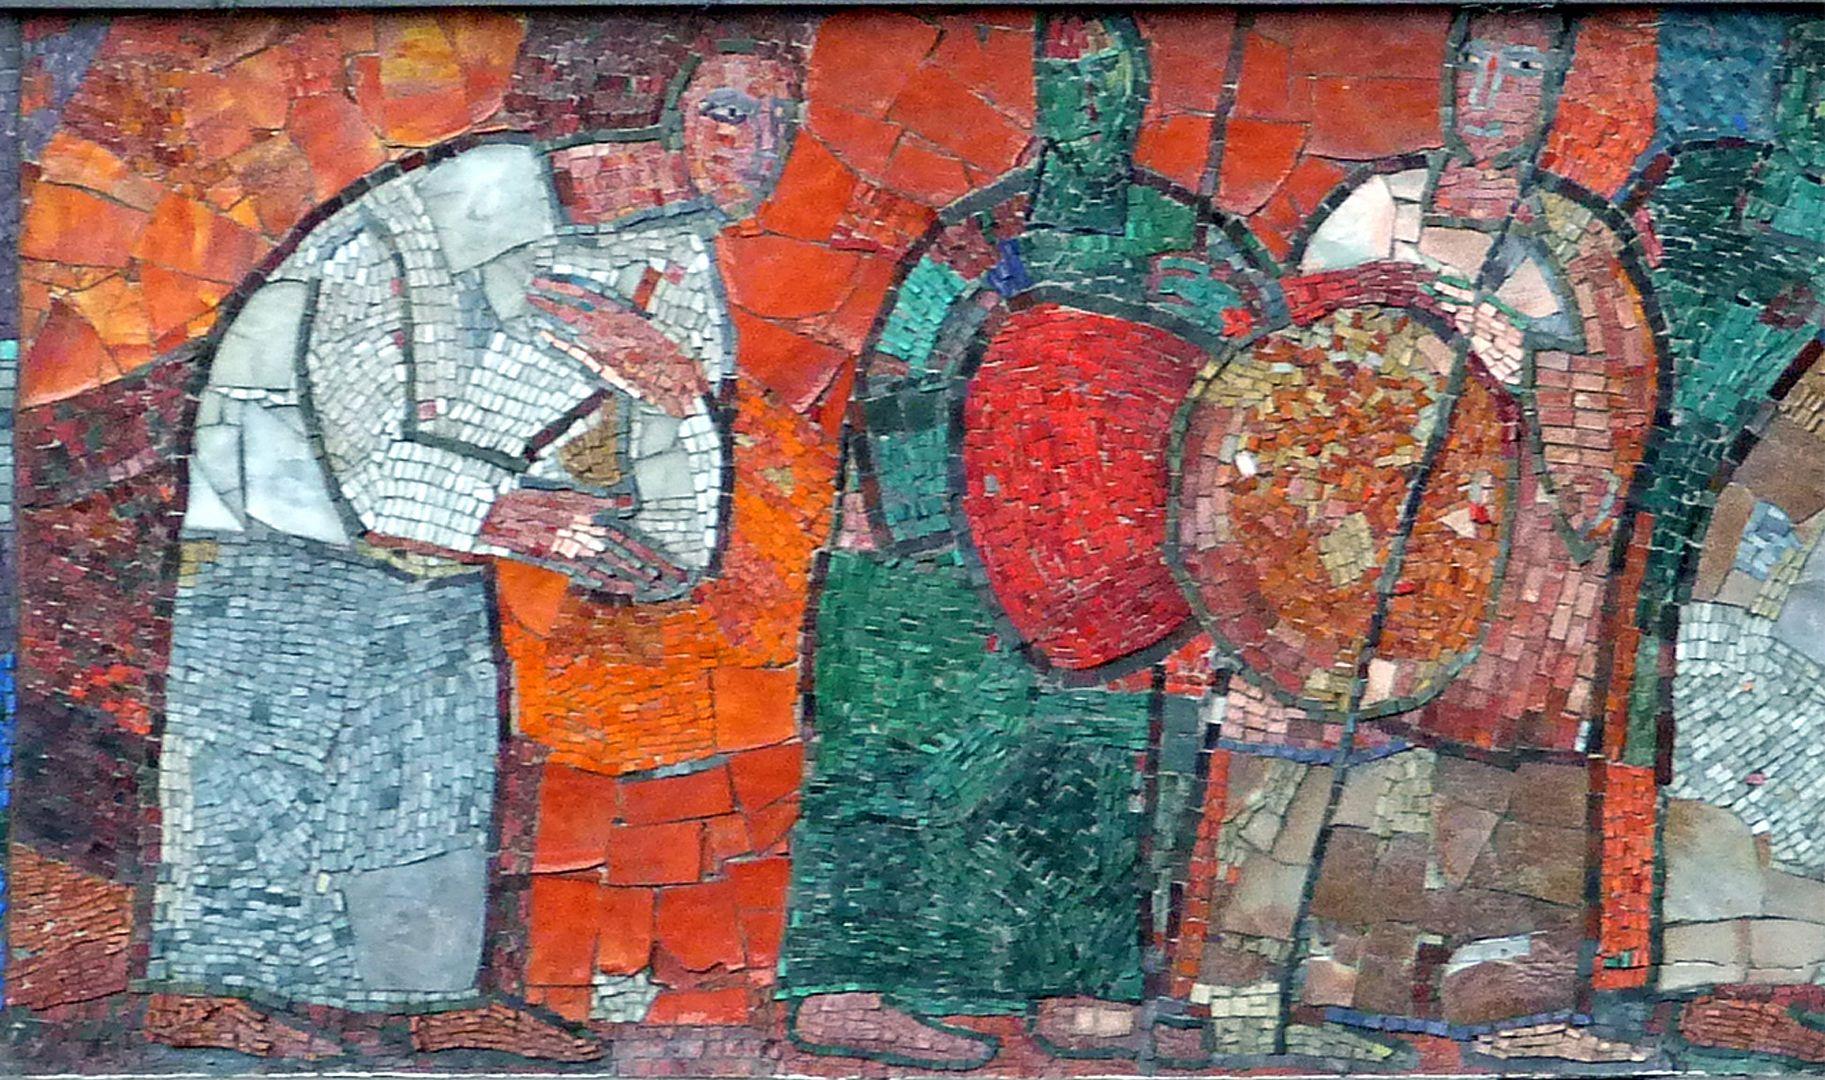 Mosaic on the Main Market (Hauptmarkt) in Nuremberg Buyers and sellers